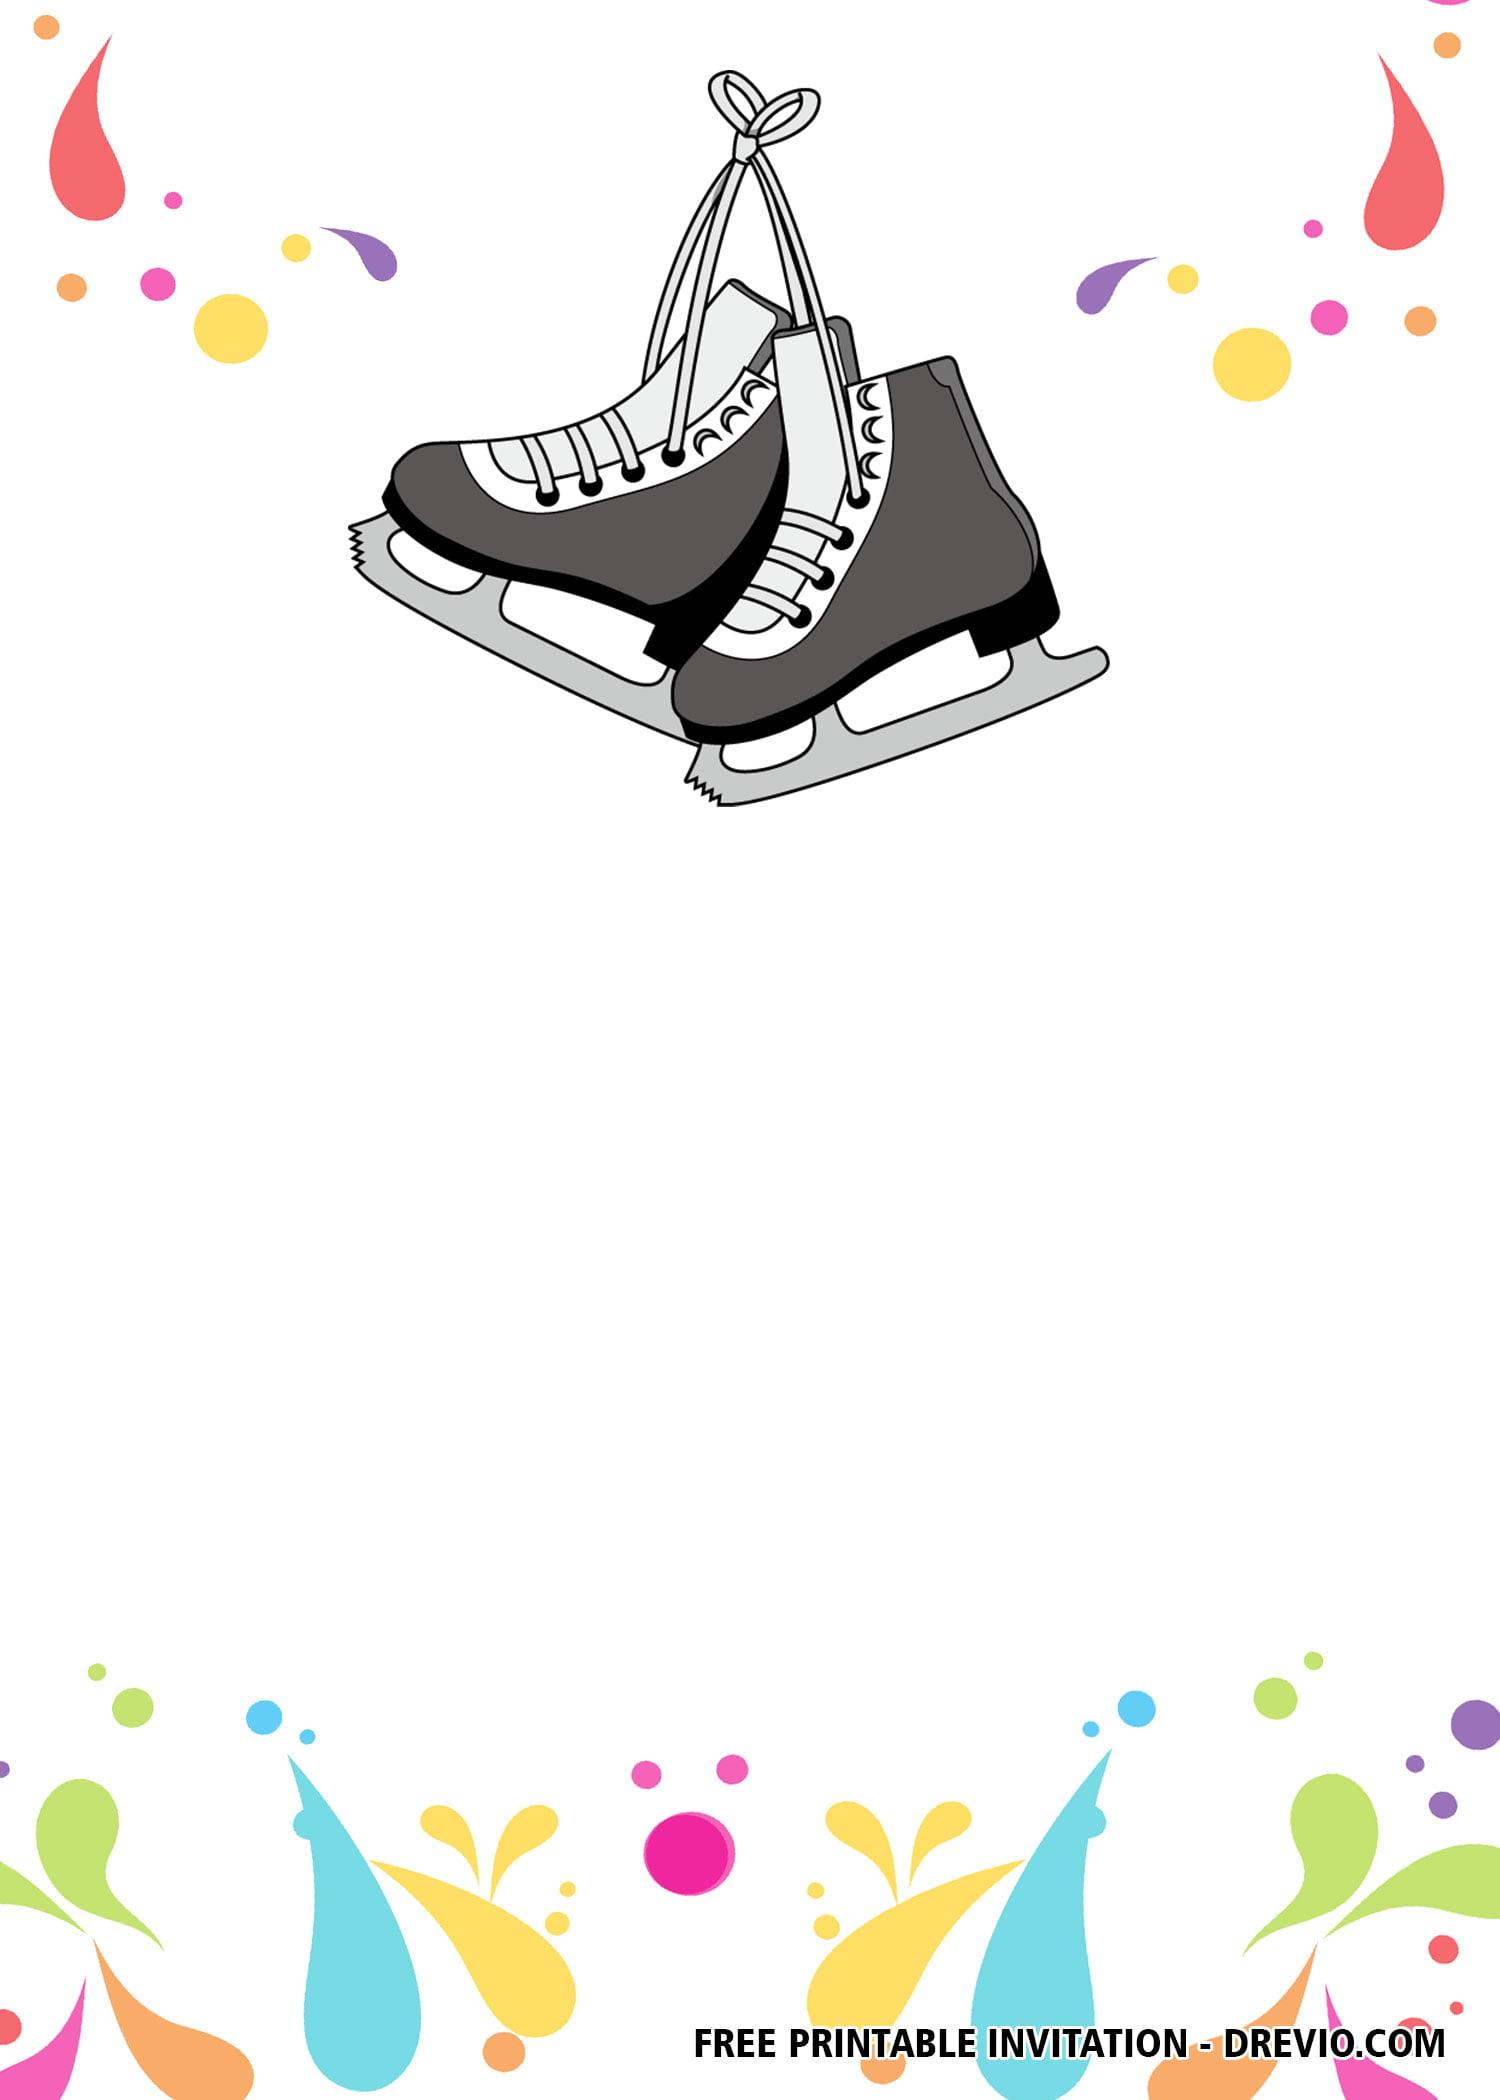 free ice skating invitation templates